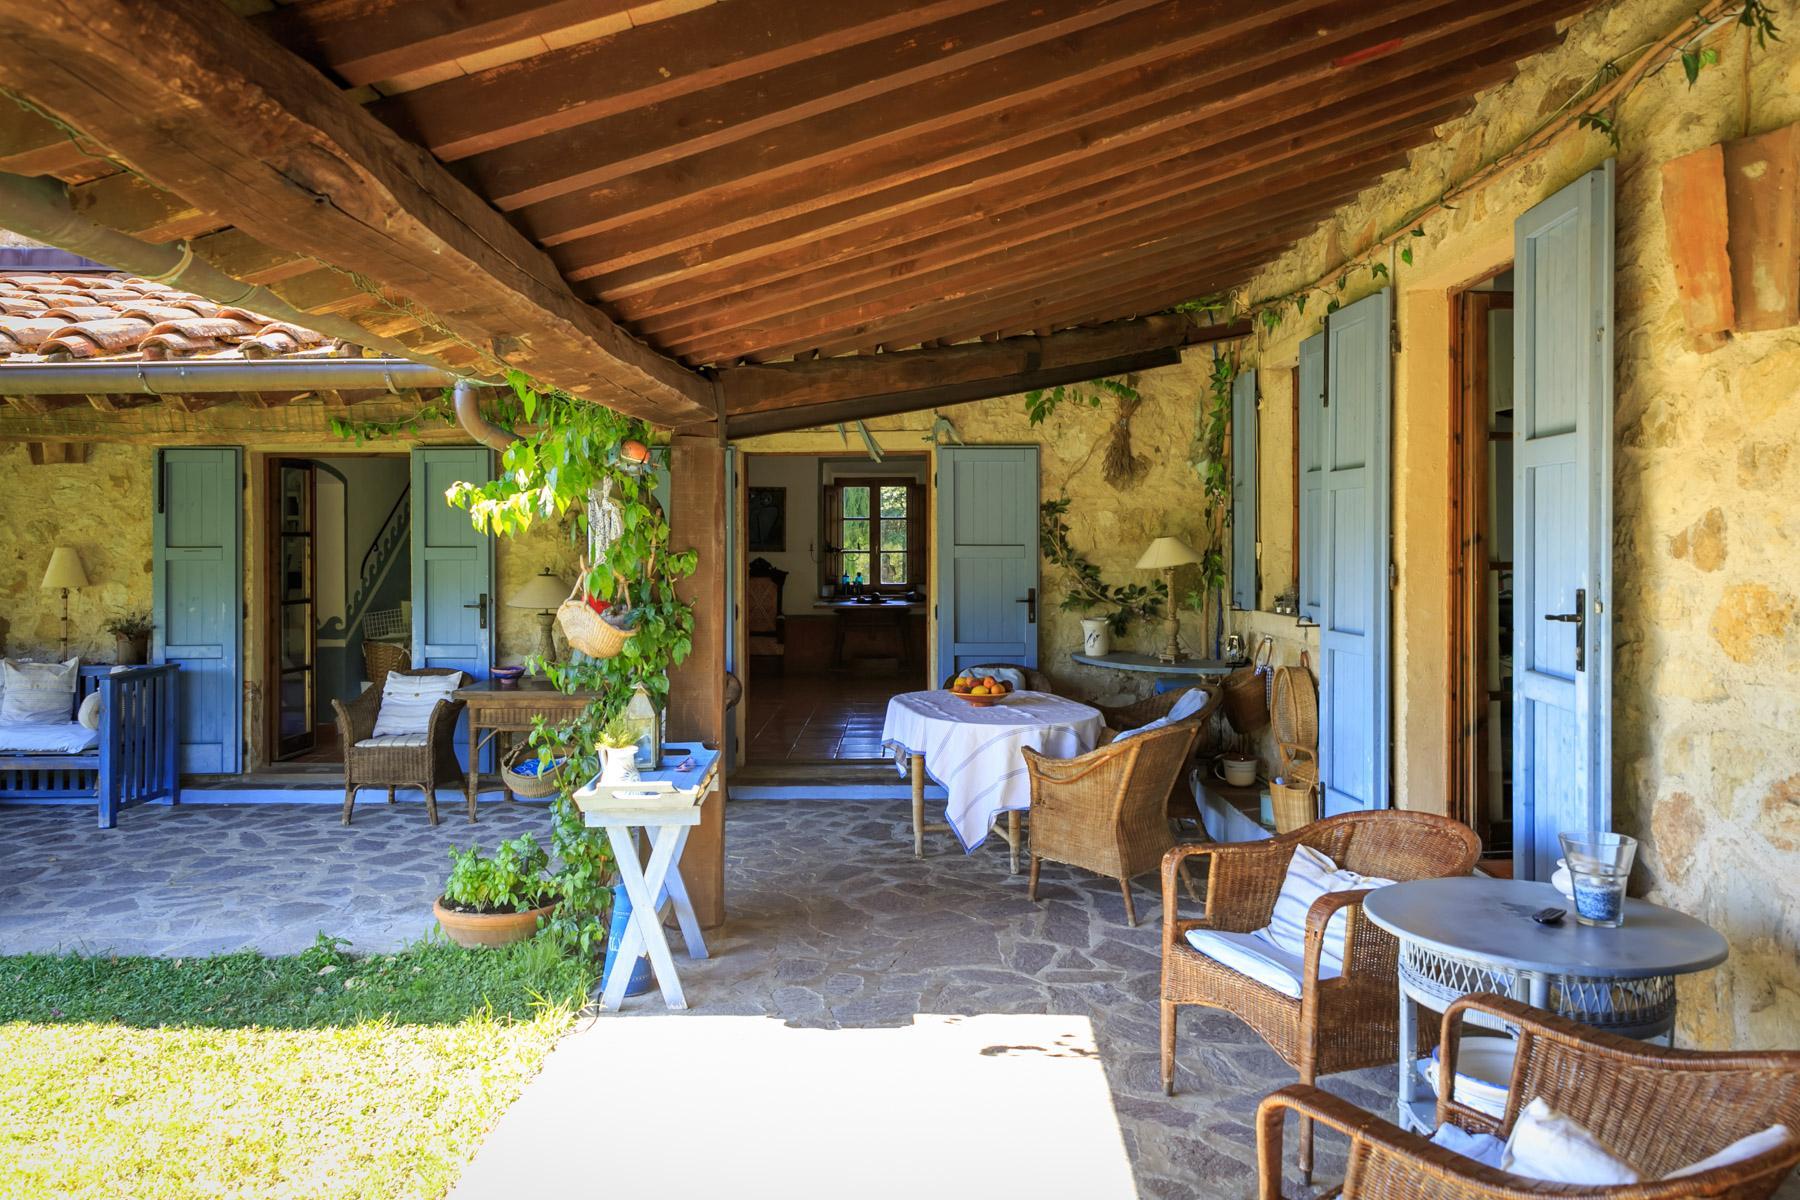 Belle villa toscane avec piscine - 9